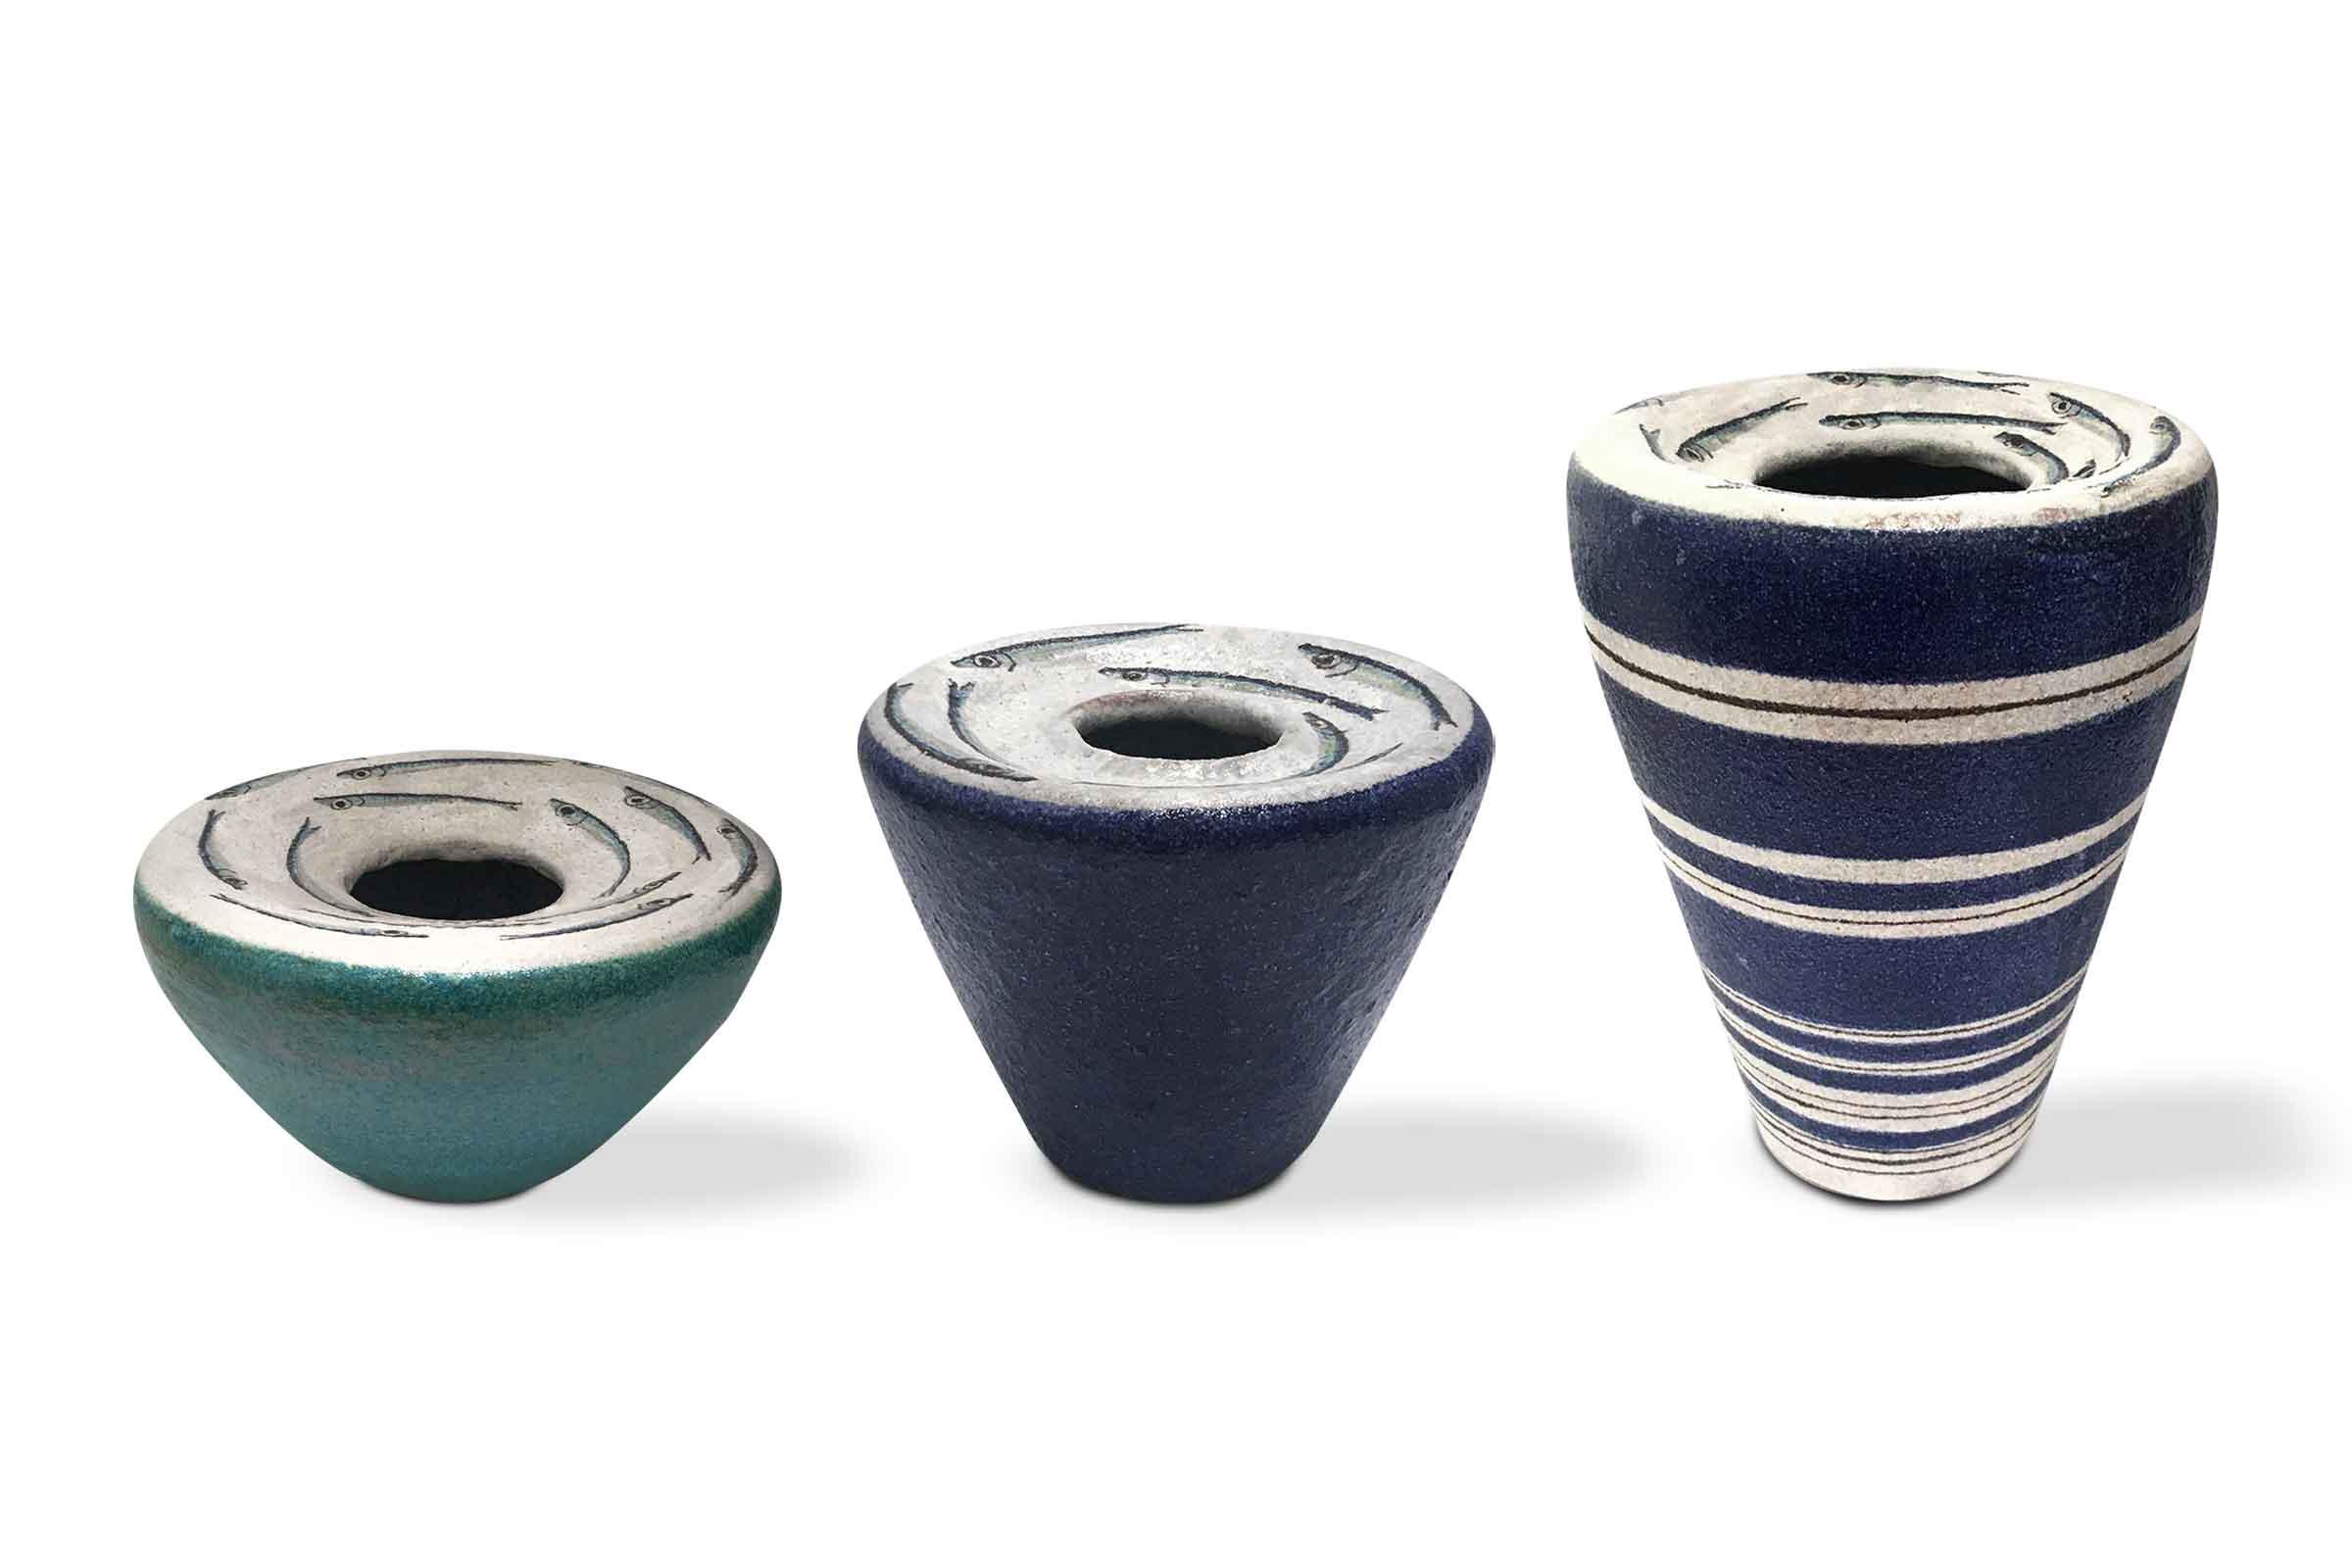 Vasi In Ceramica Di Vietri.Vasi In Ceramica Di Vietri Solimeneart